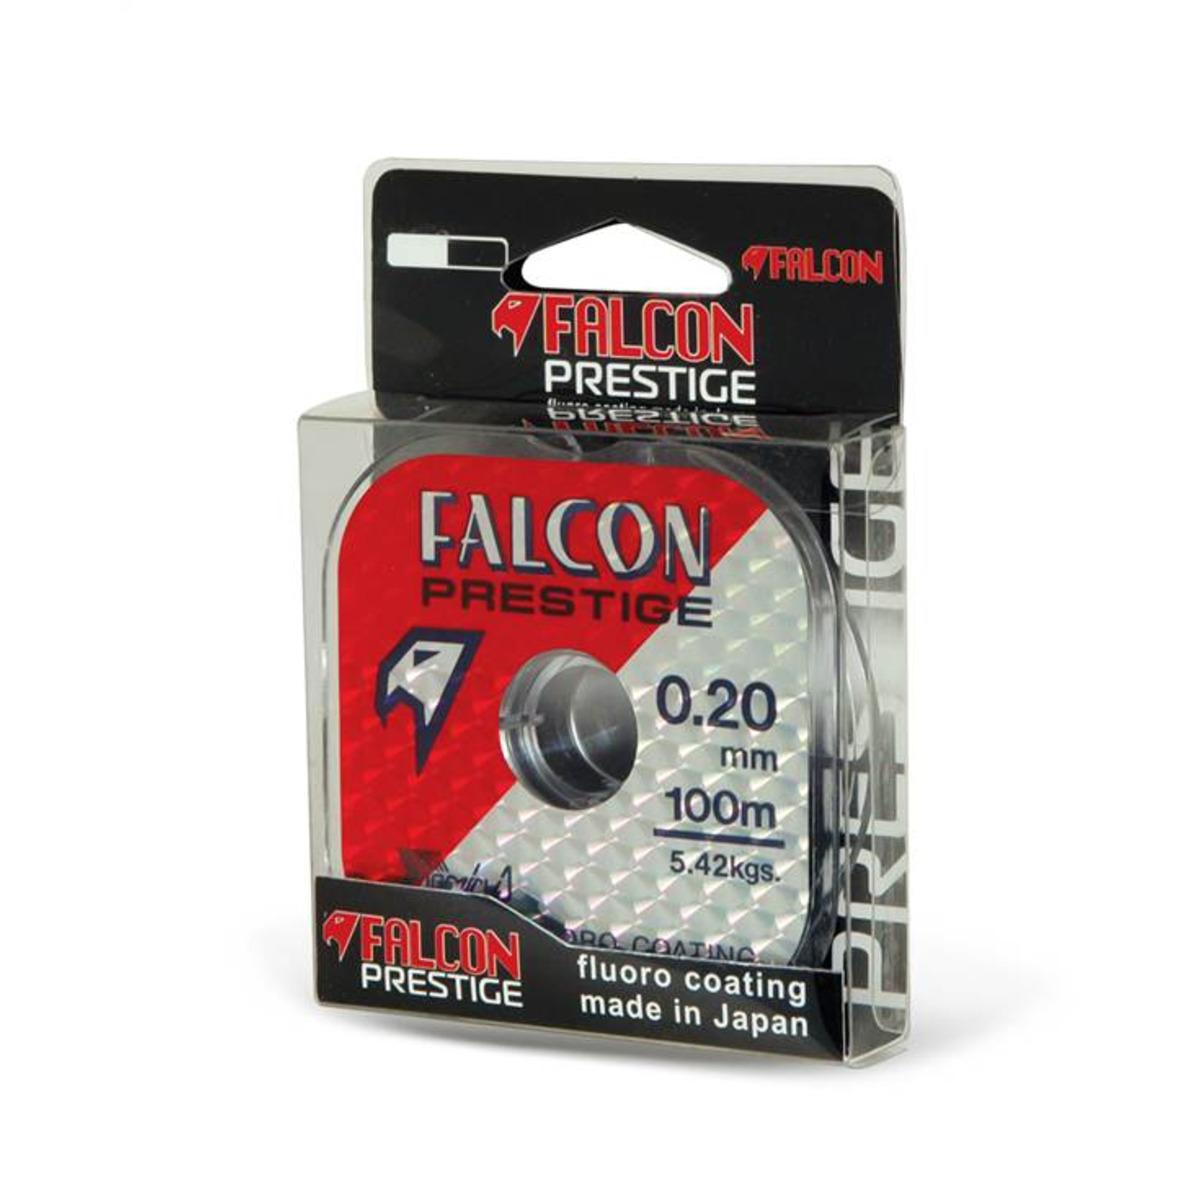 Falcon Prestige Blister Fluoro Coated - 100 m - 0.300 mm